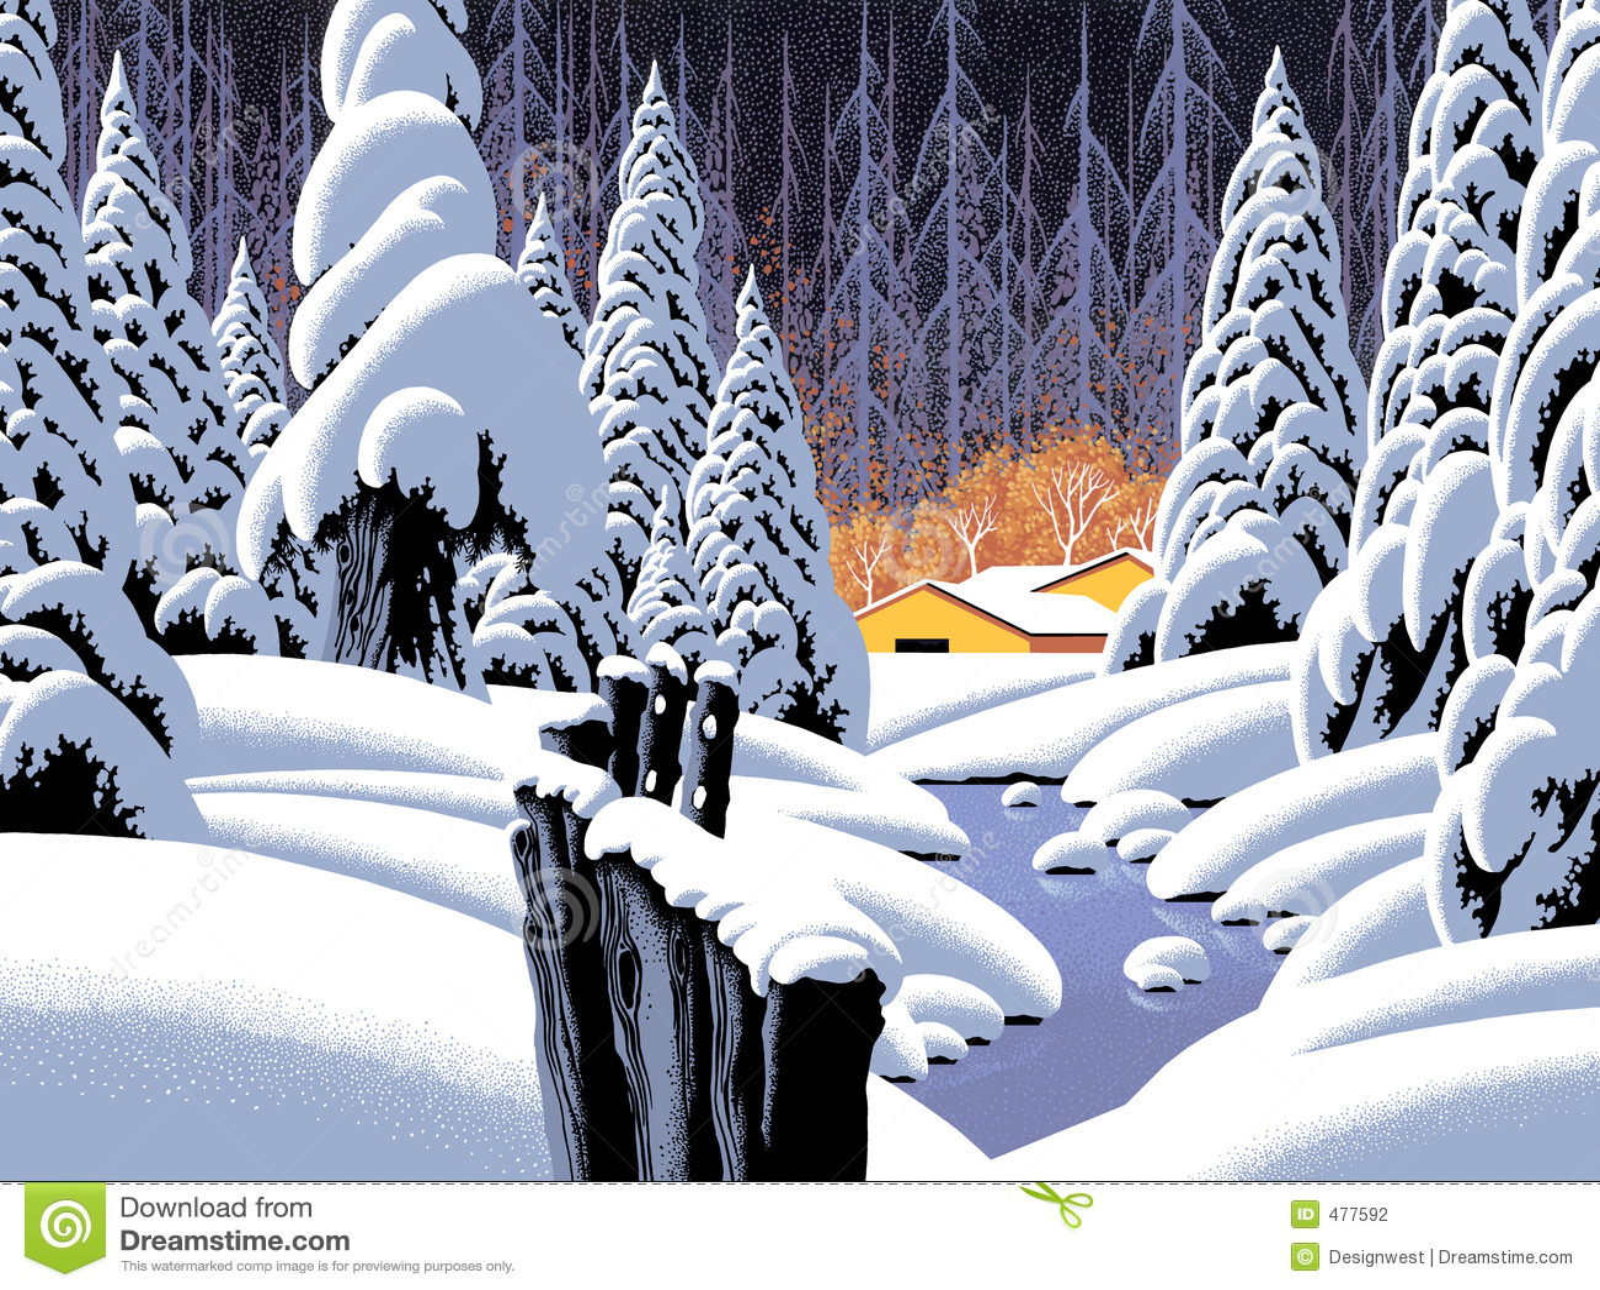 clipart snow scene - photo #38